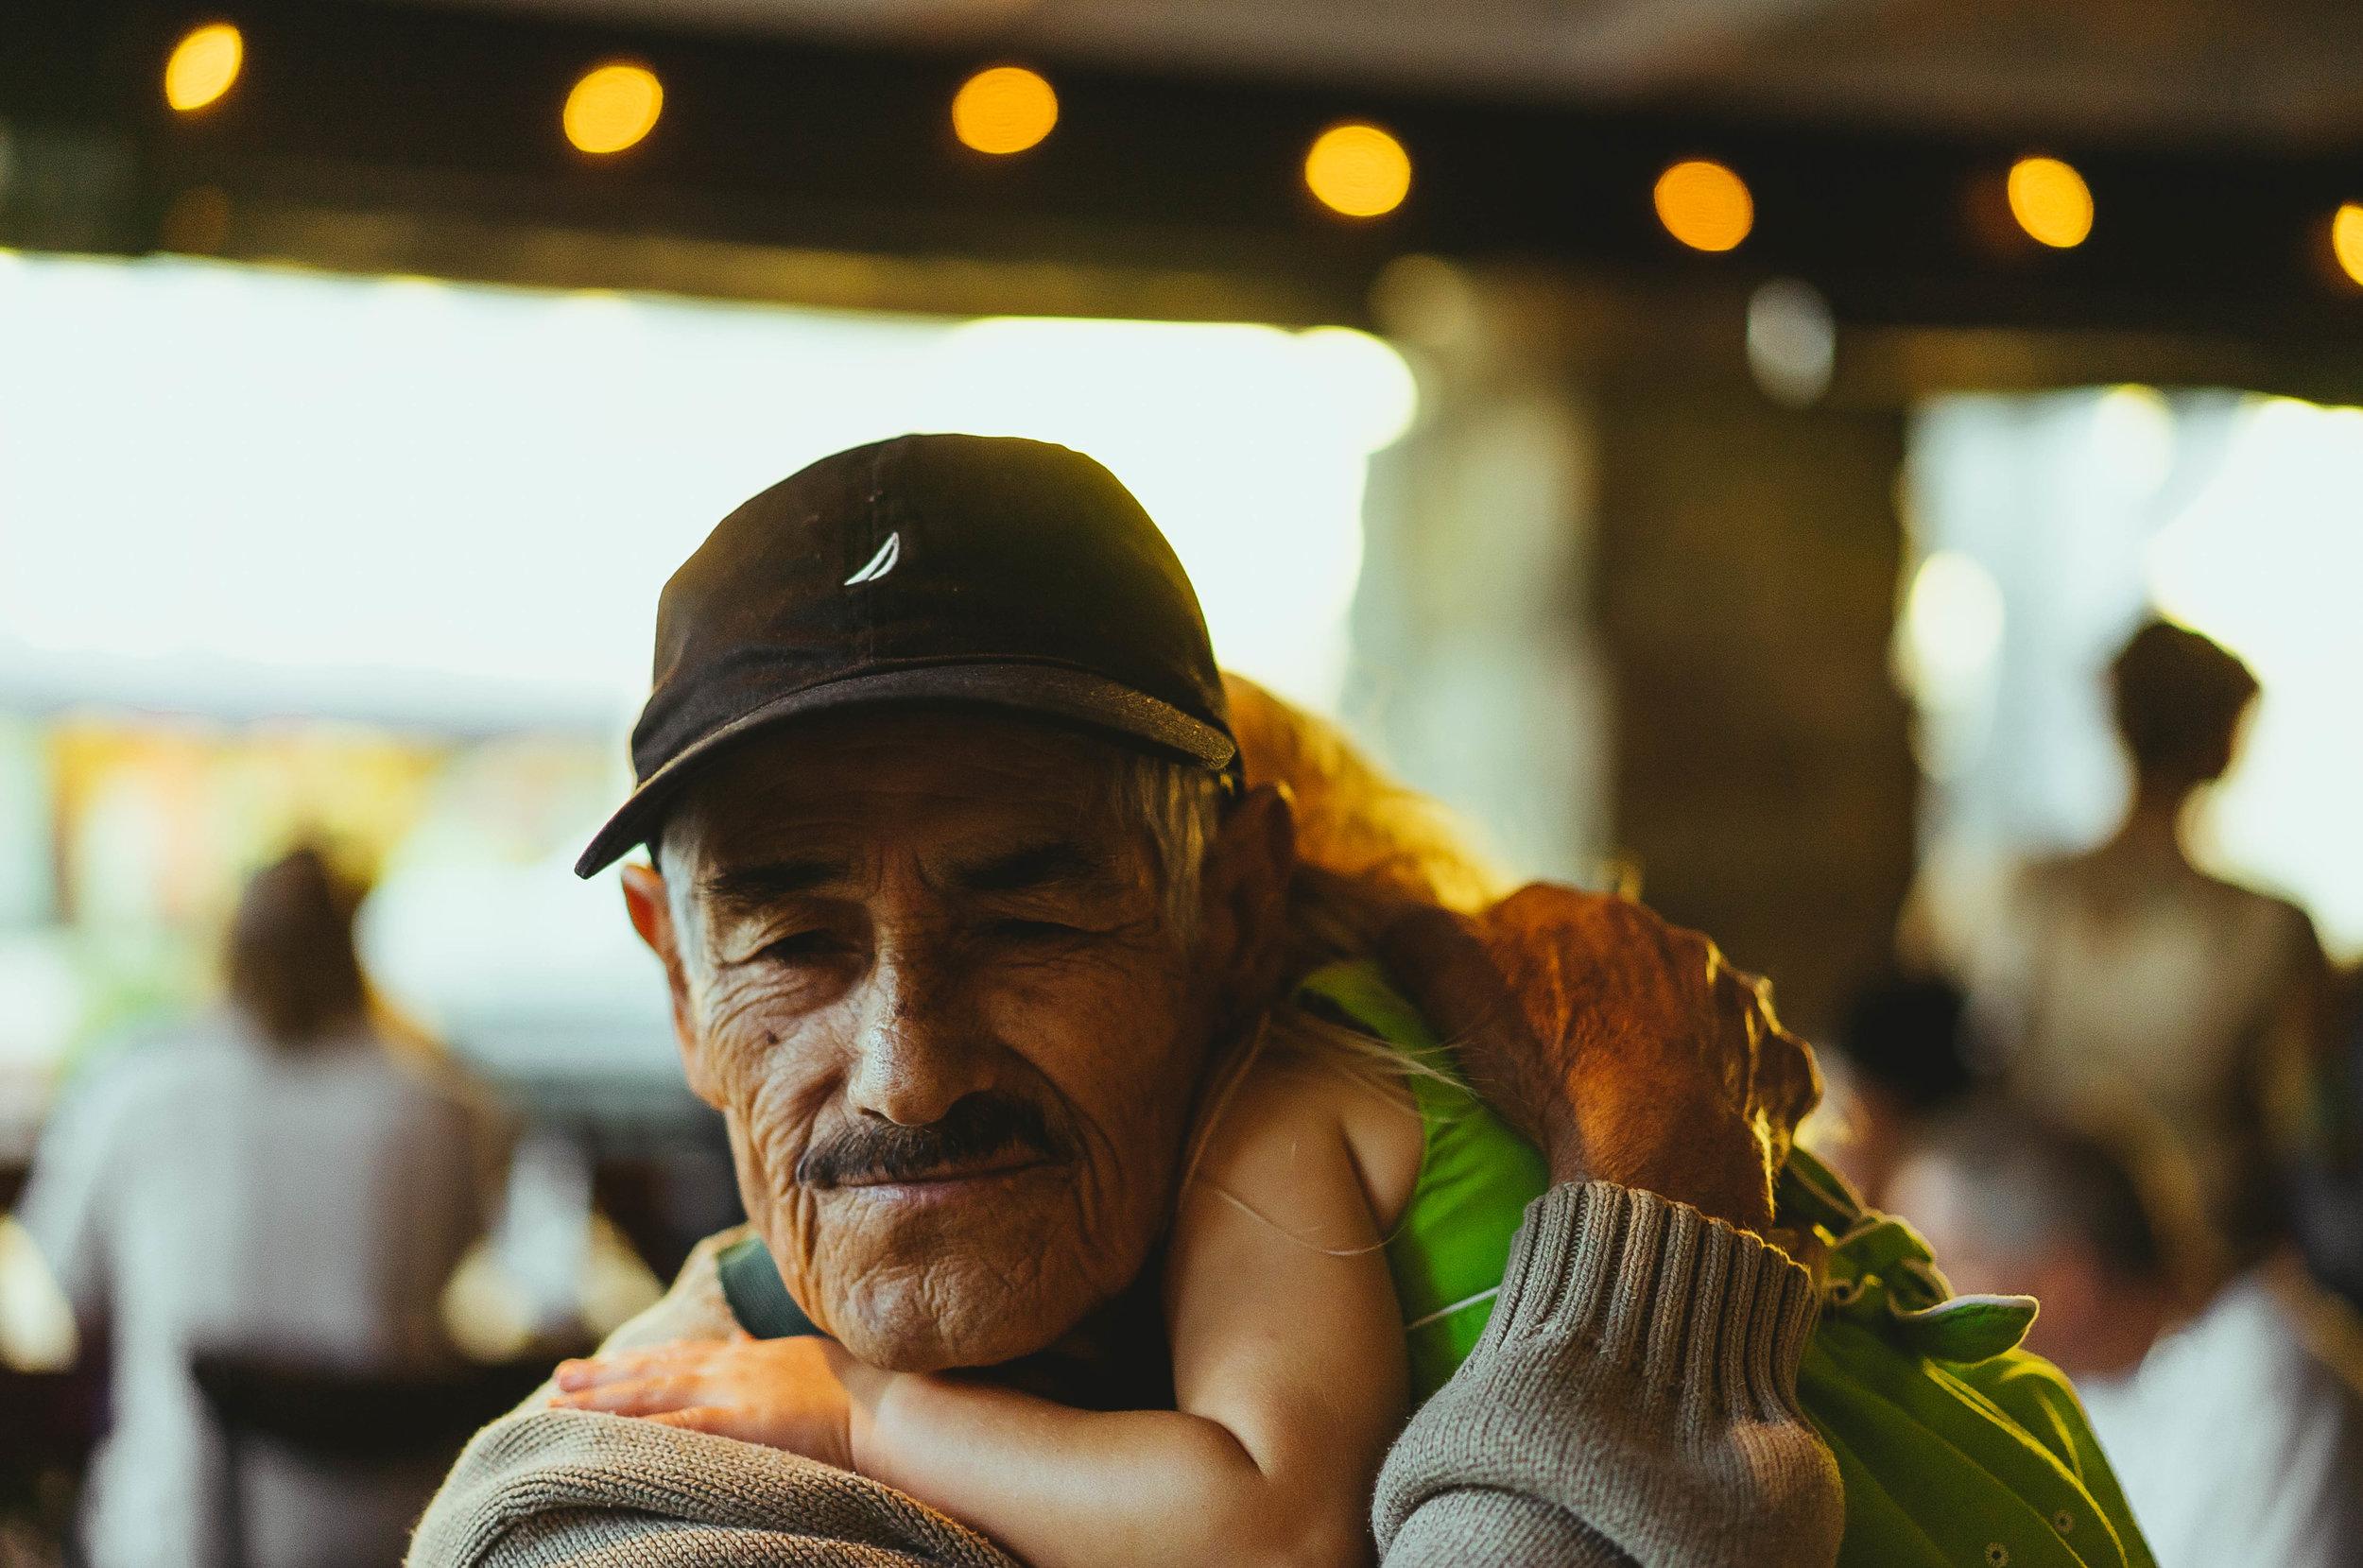 Elderly man lovingly holding sleeping toddler on his shoulders.